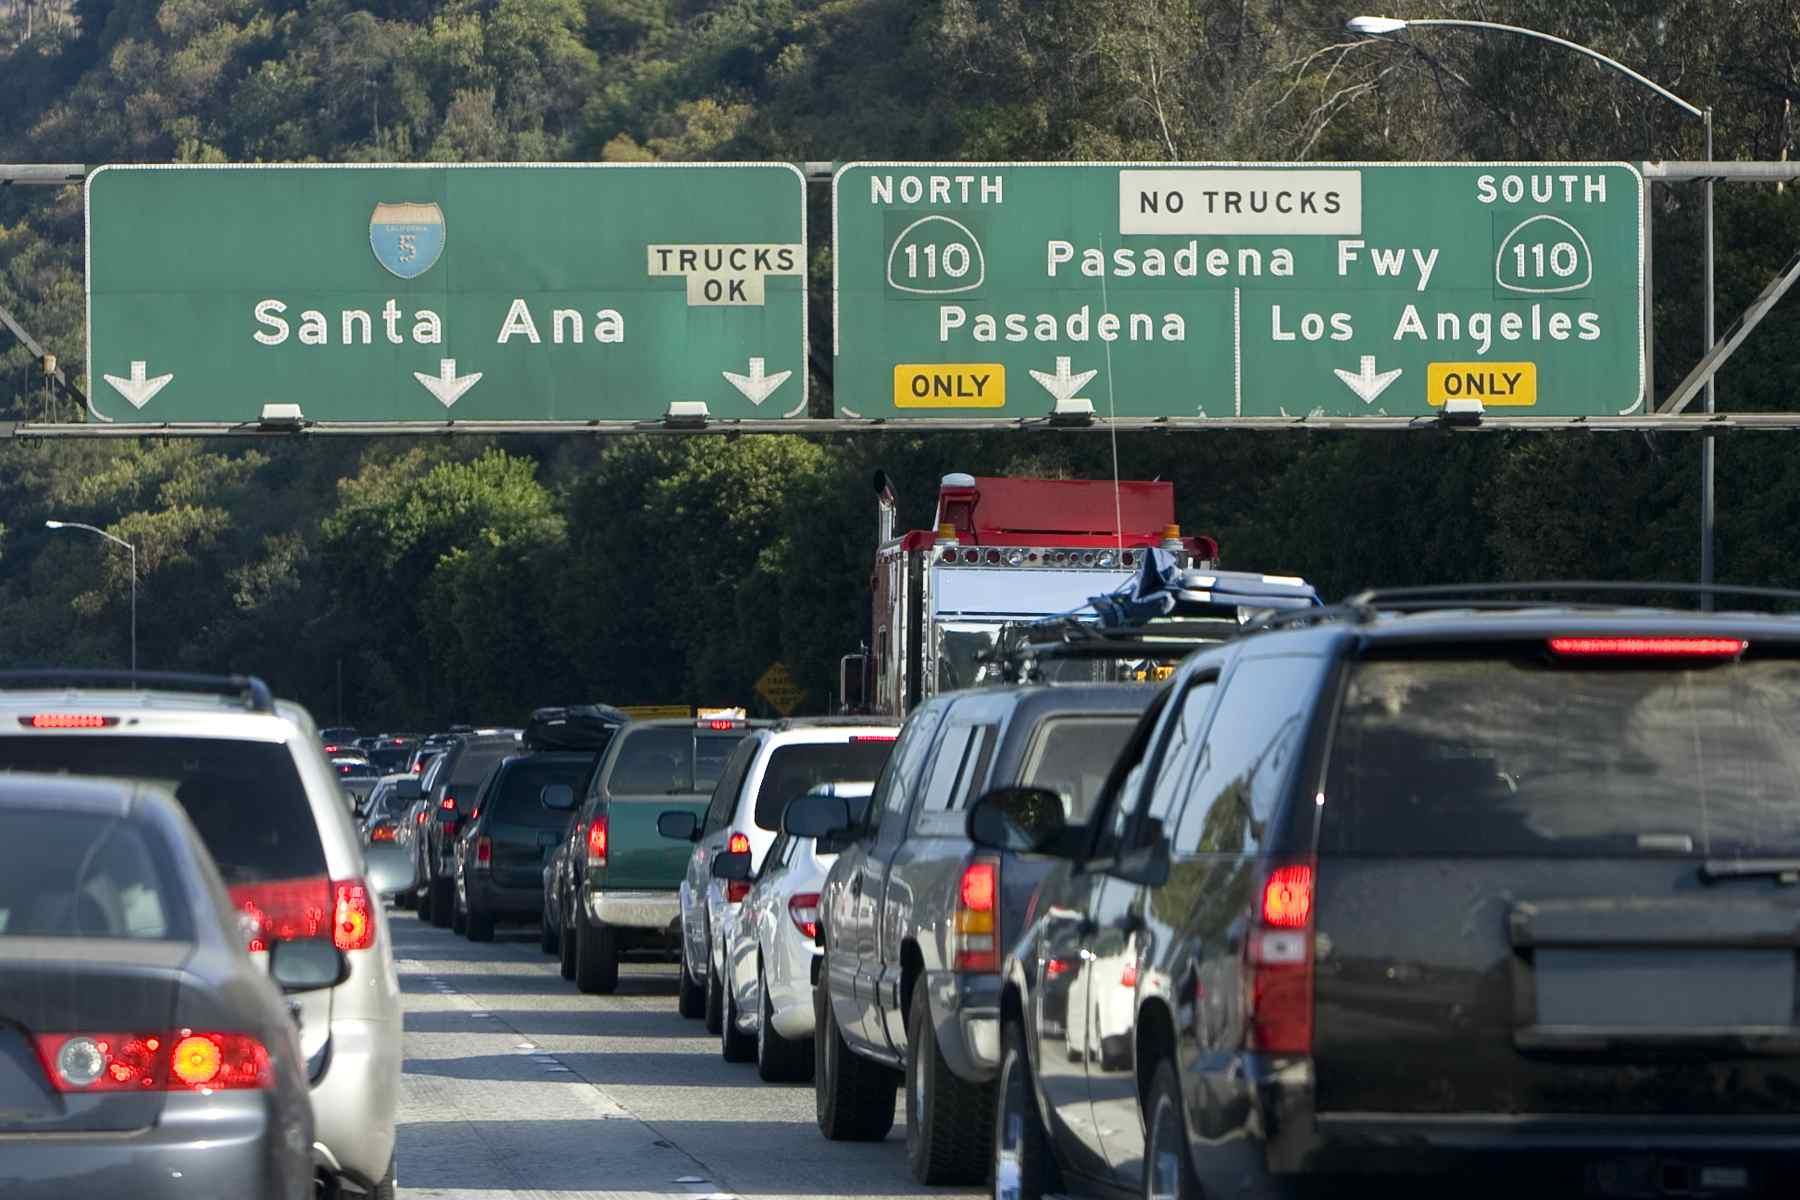 LA freeway signs